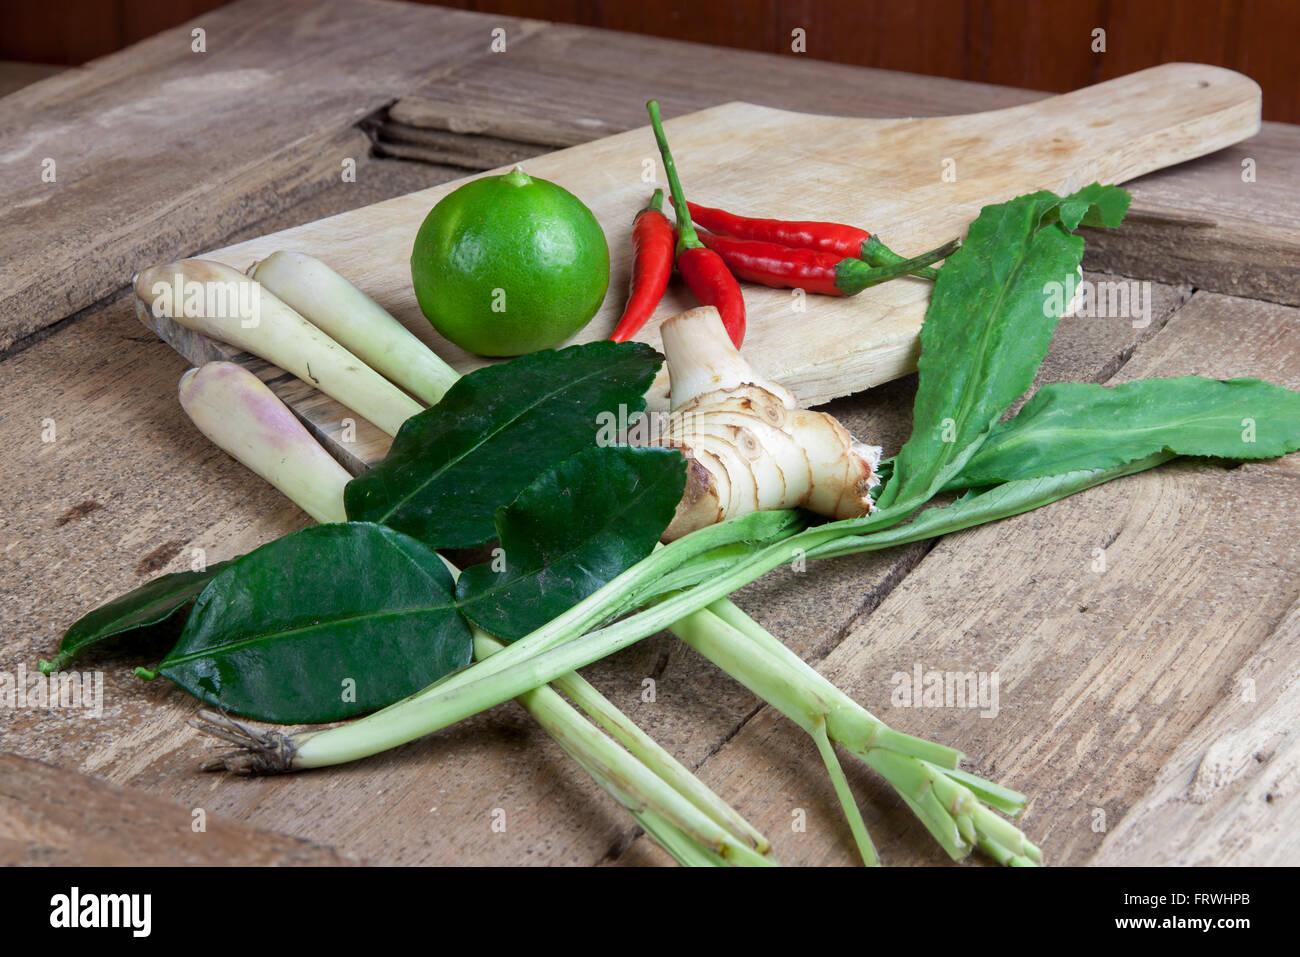 koong stock photos koong stock images alamy